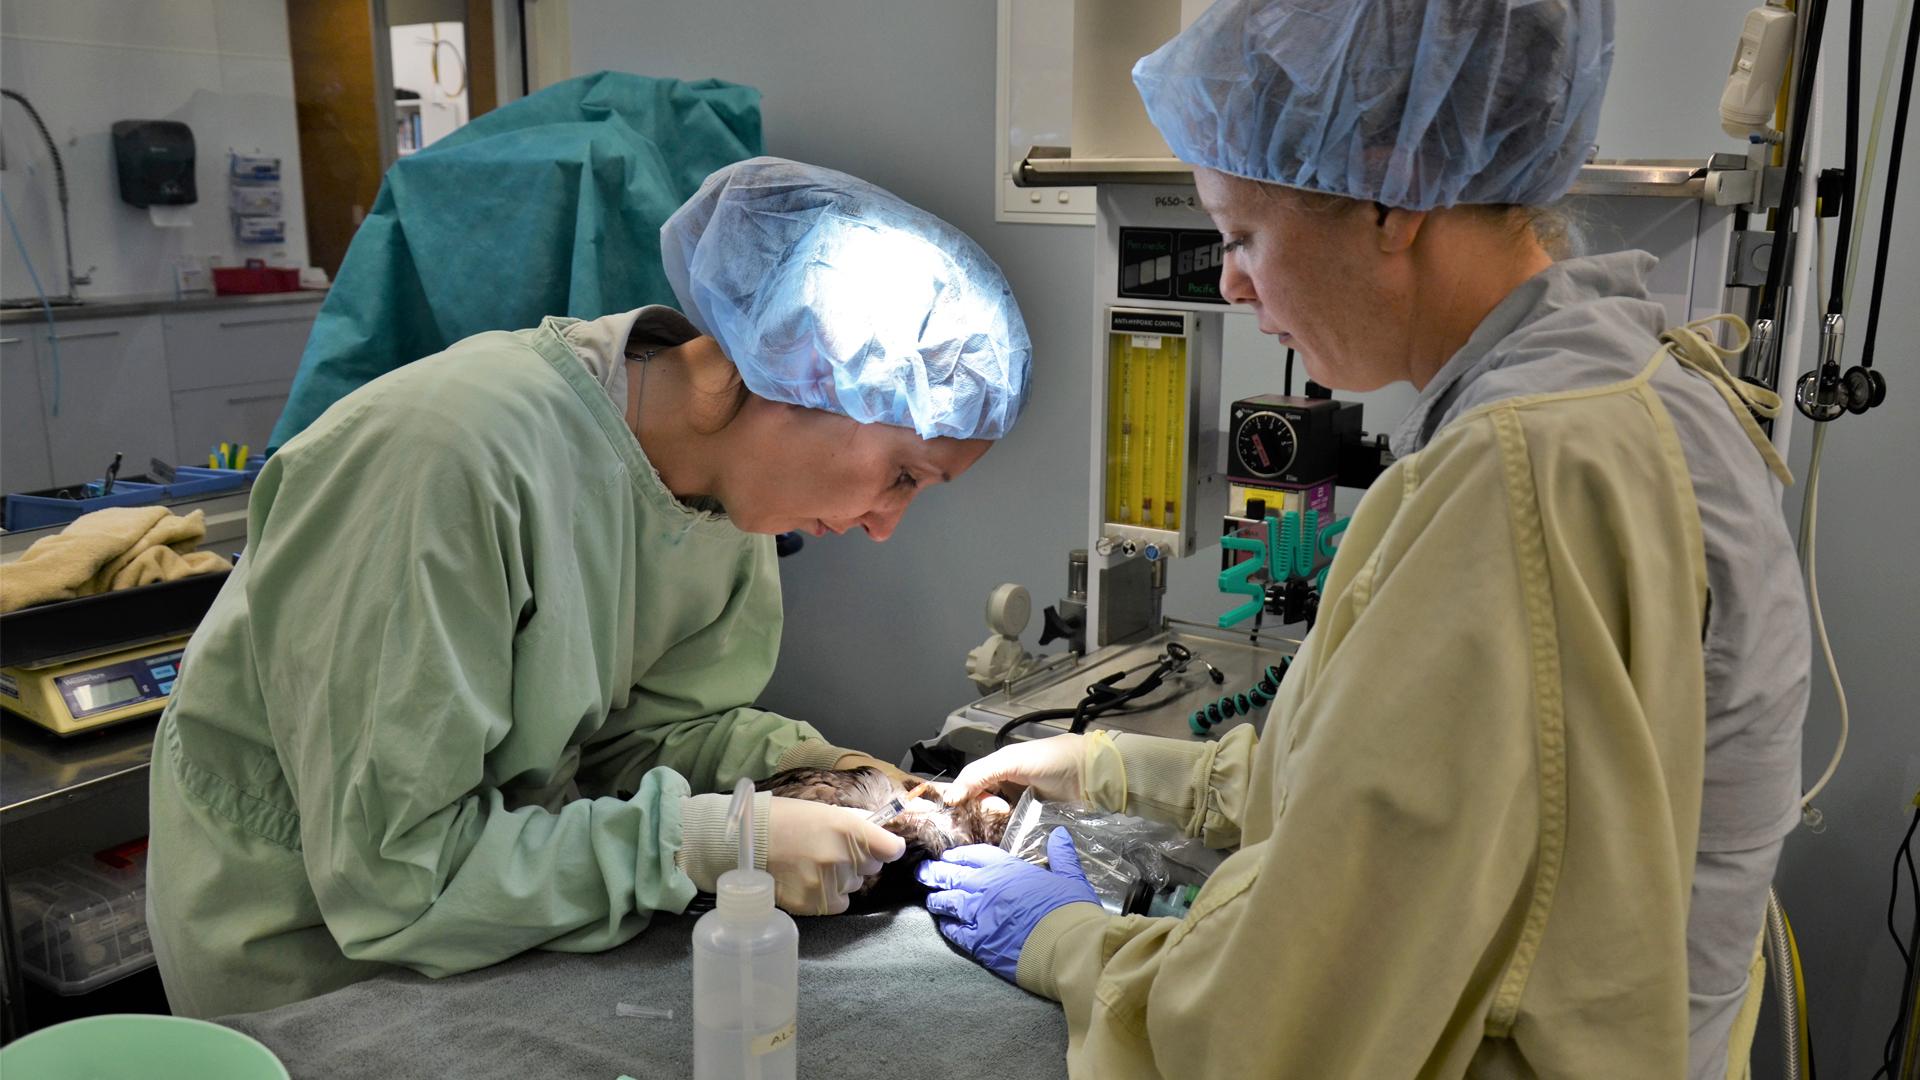 https://rfacdn.nz/zoo/assets/media/kaka-vet-hospital-gallery-1.jpg